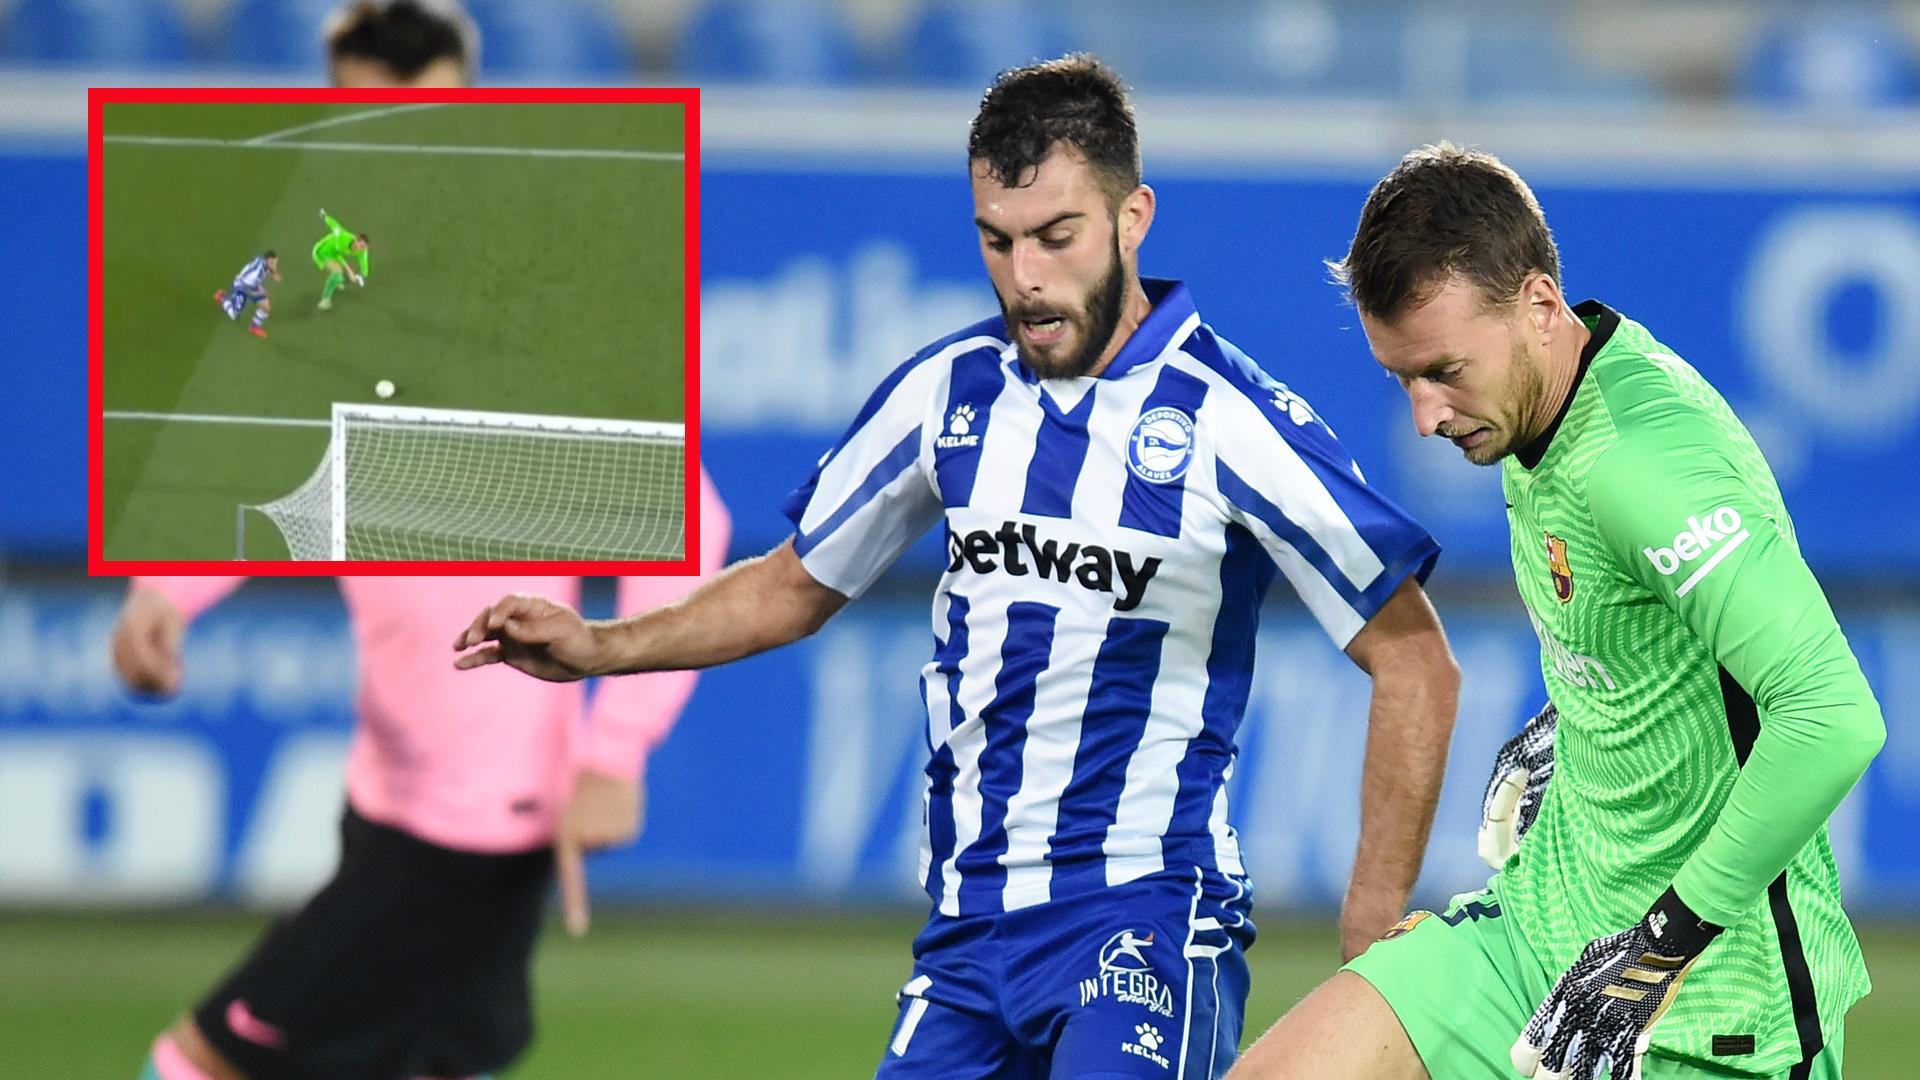 El esperpéntico error de Neto que le costó el gol al Barça frente al Alavés    Goal.com